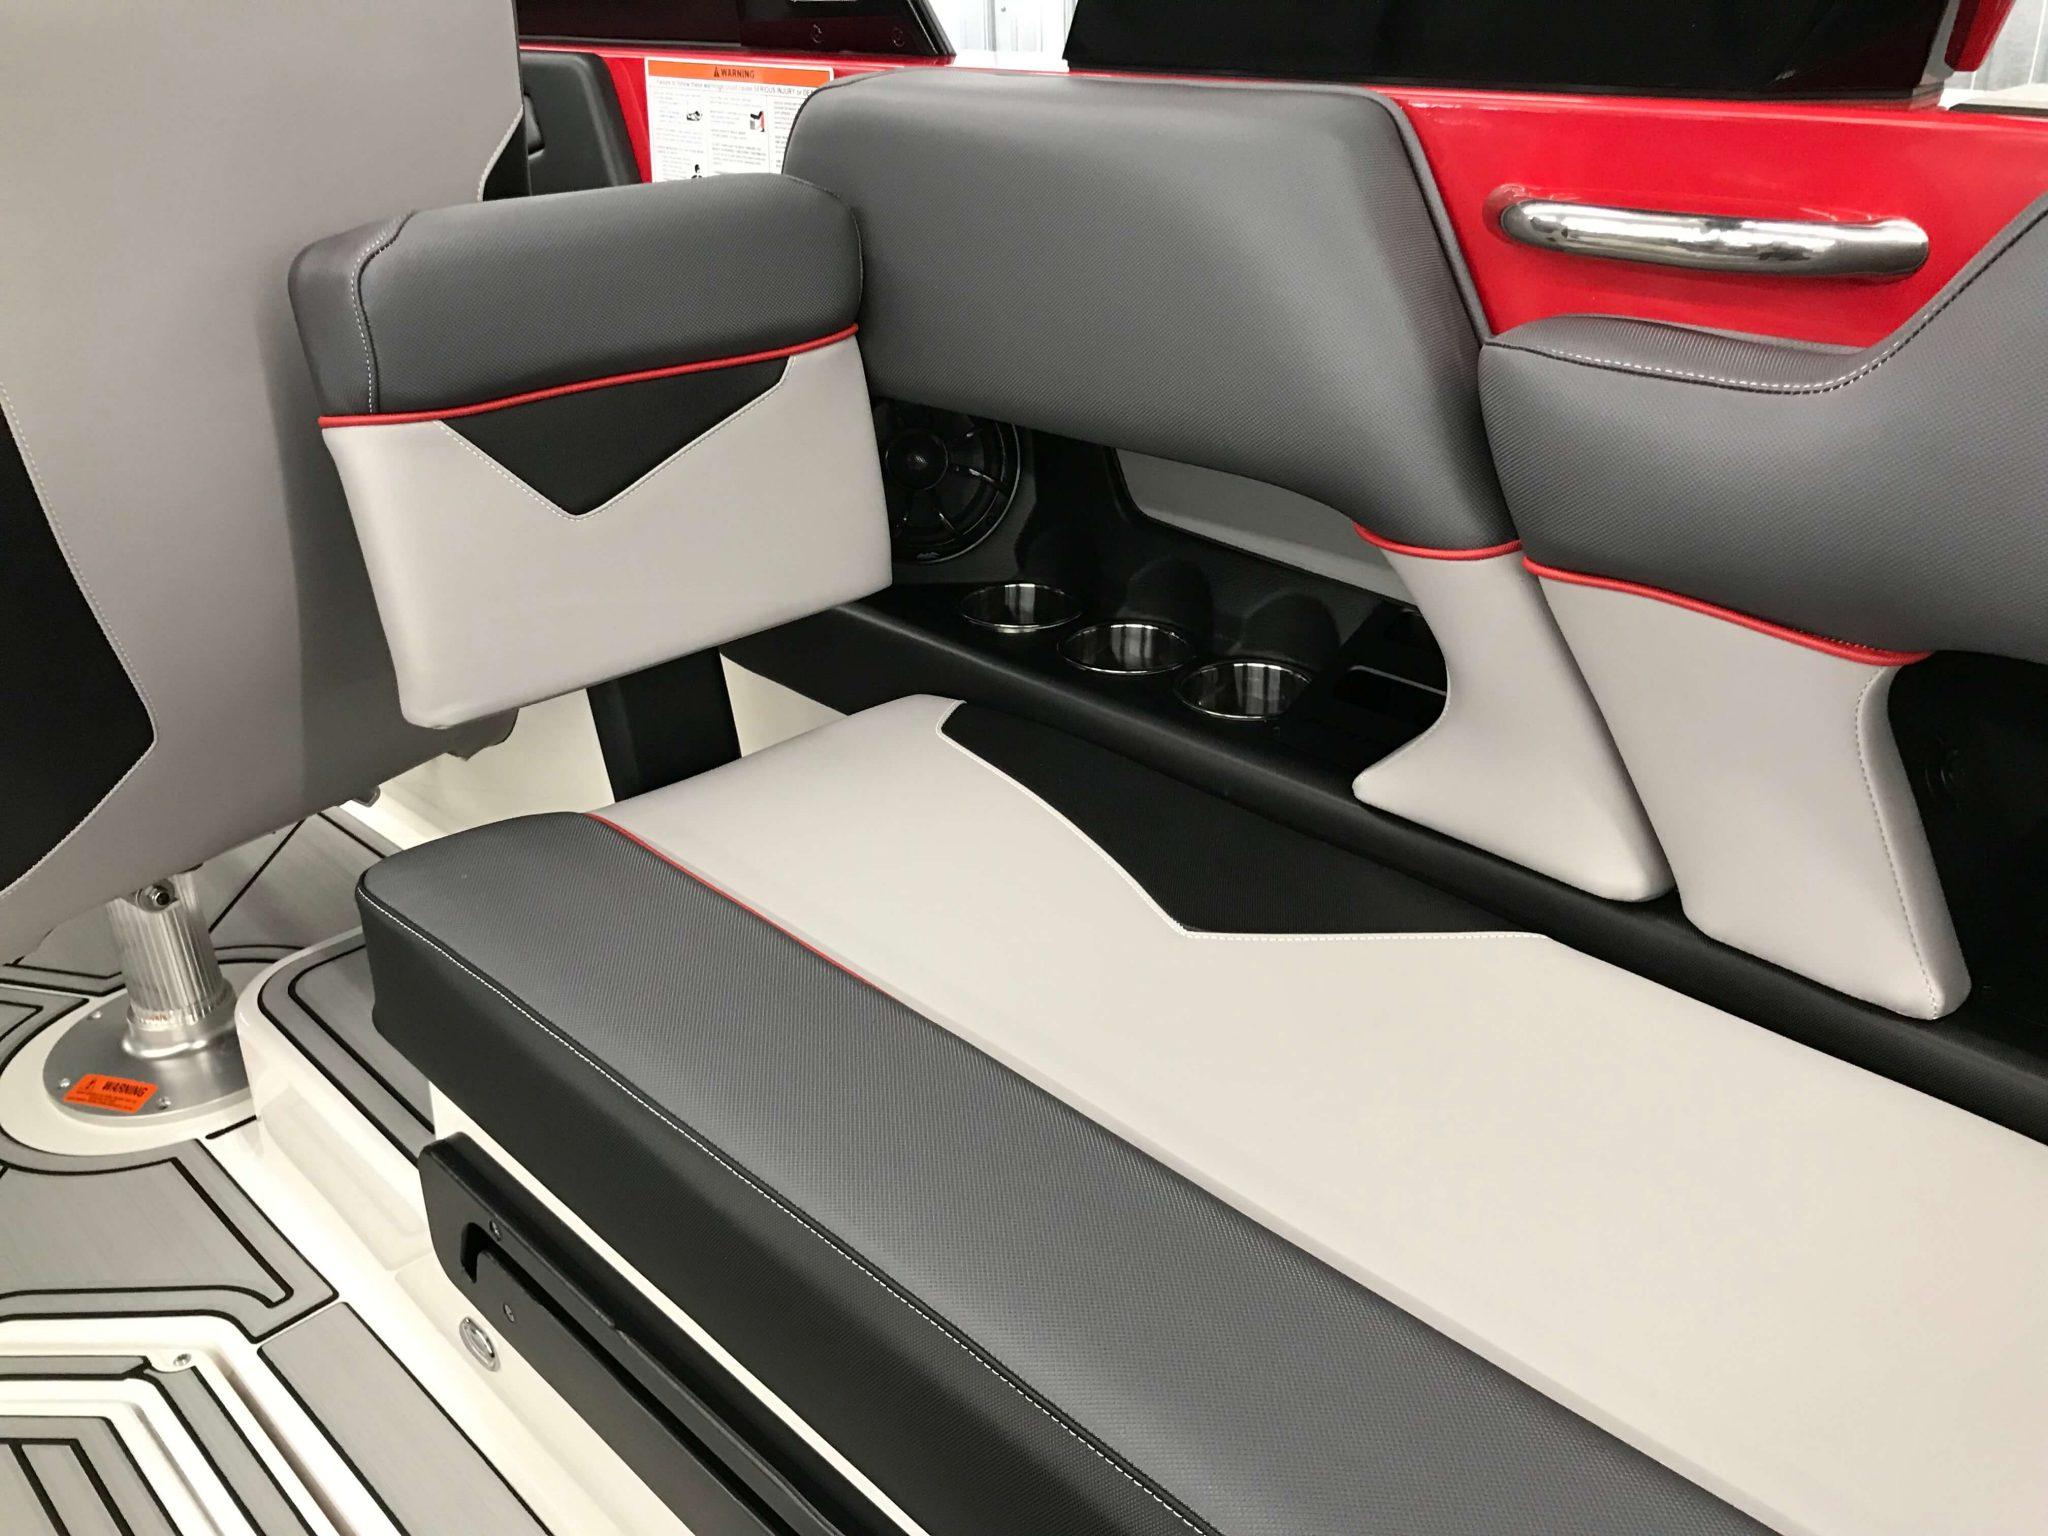 2019 Moomba Makai Rear Facing Seat Back Kit